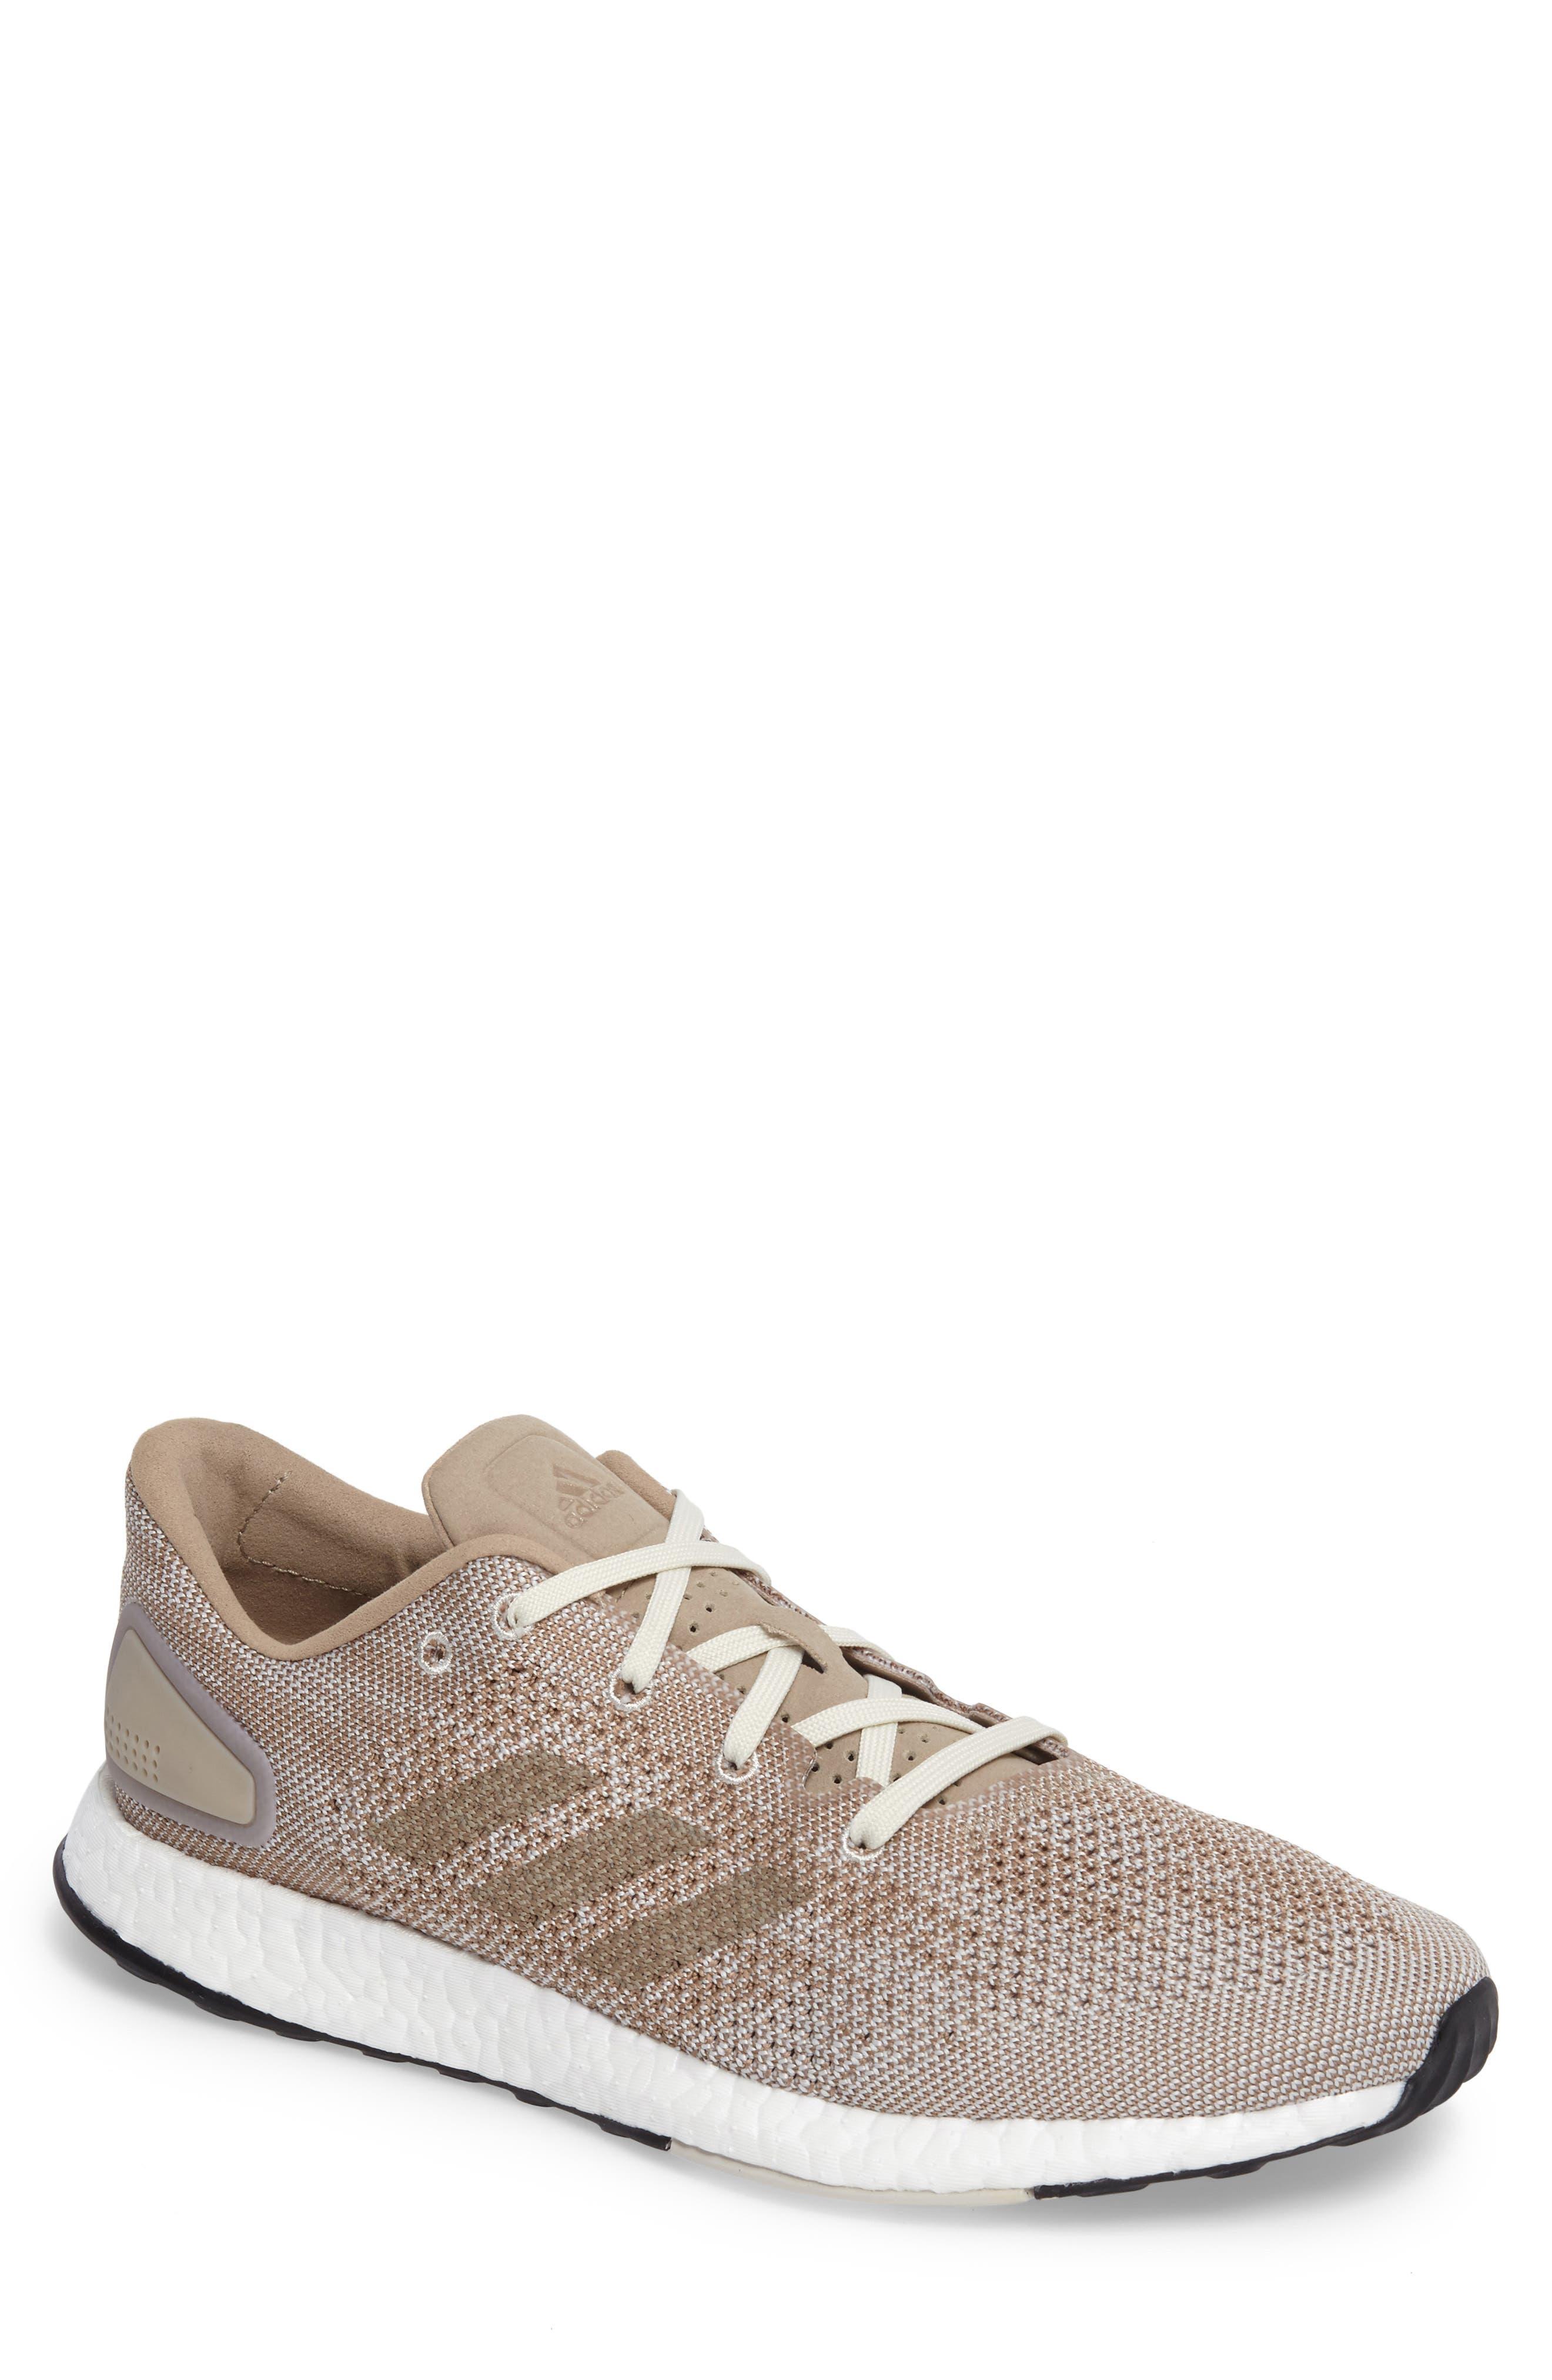 Main Image - adidas Pureboost DPR Running Shoe (Men)